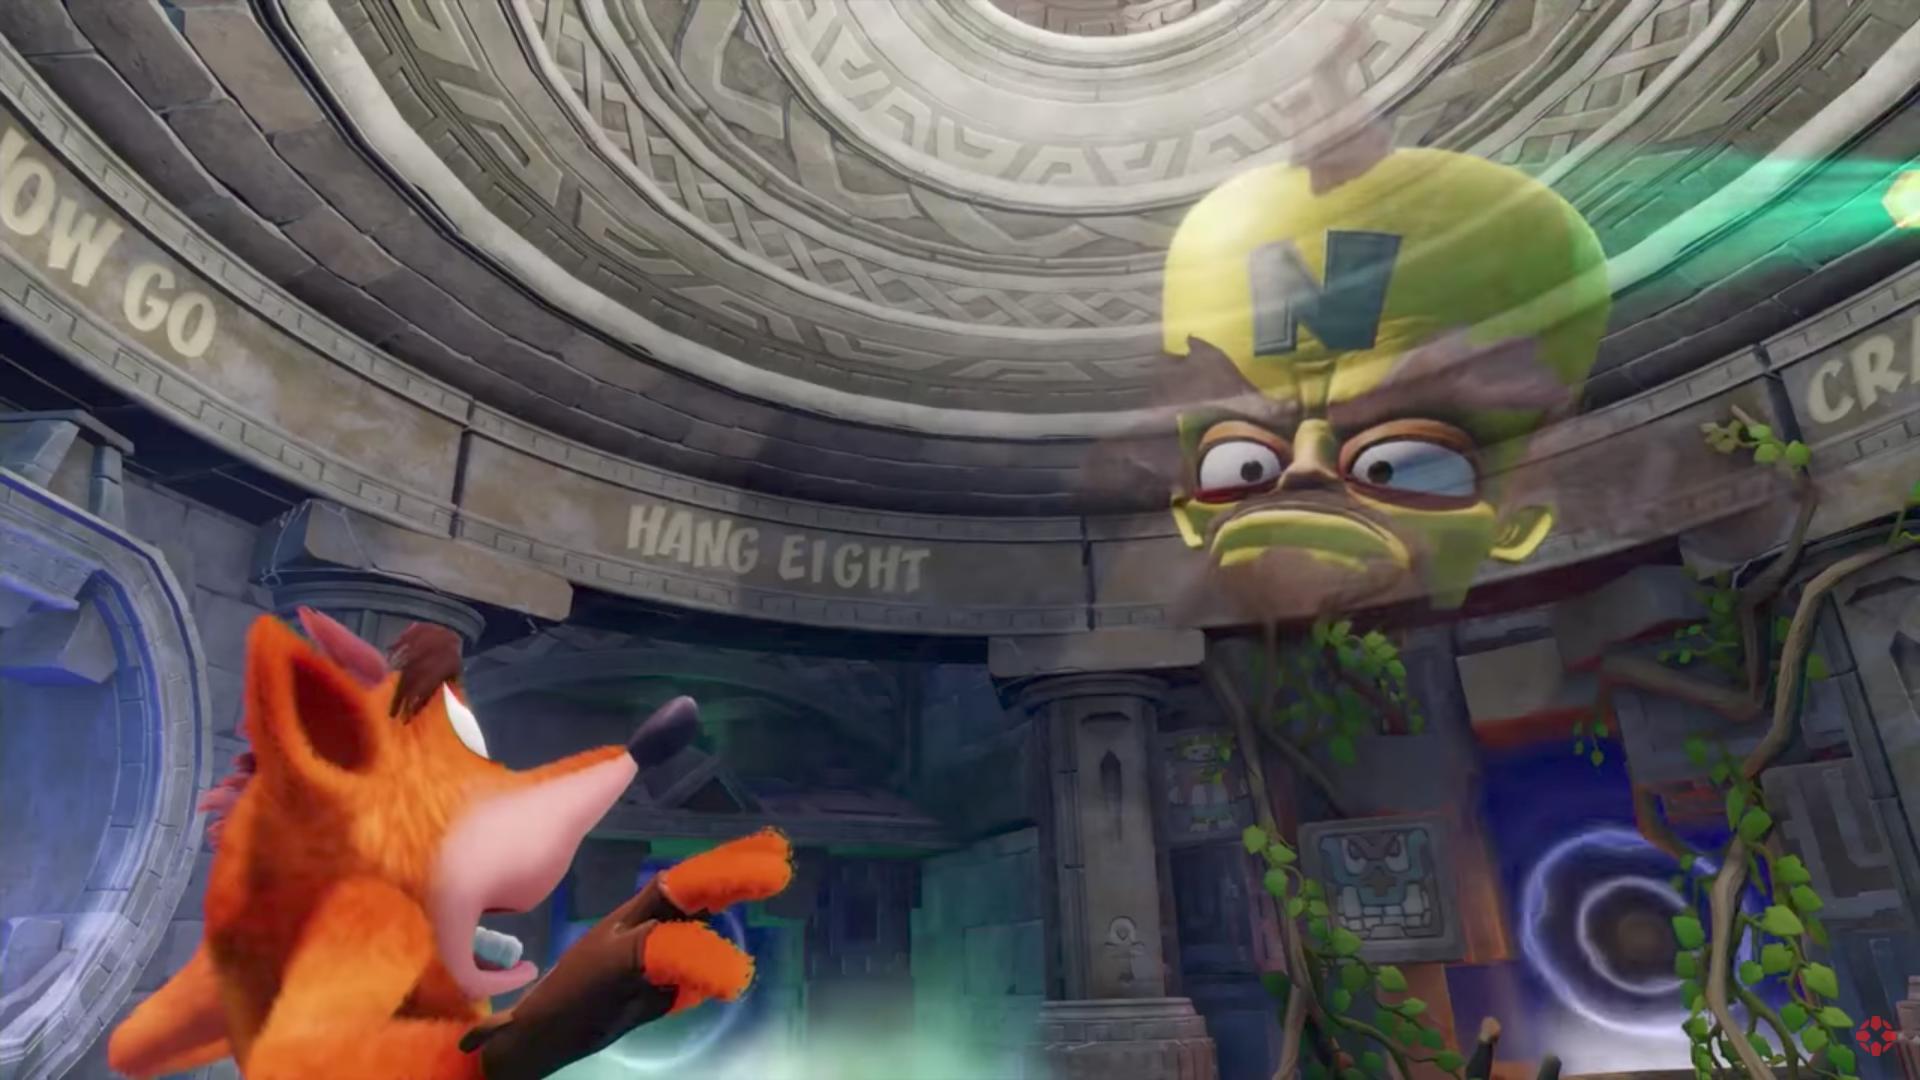 Crash Bandicoot Gameplay and History Overview Crash